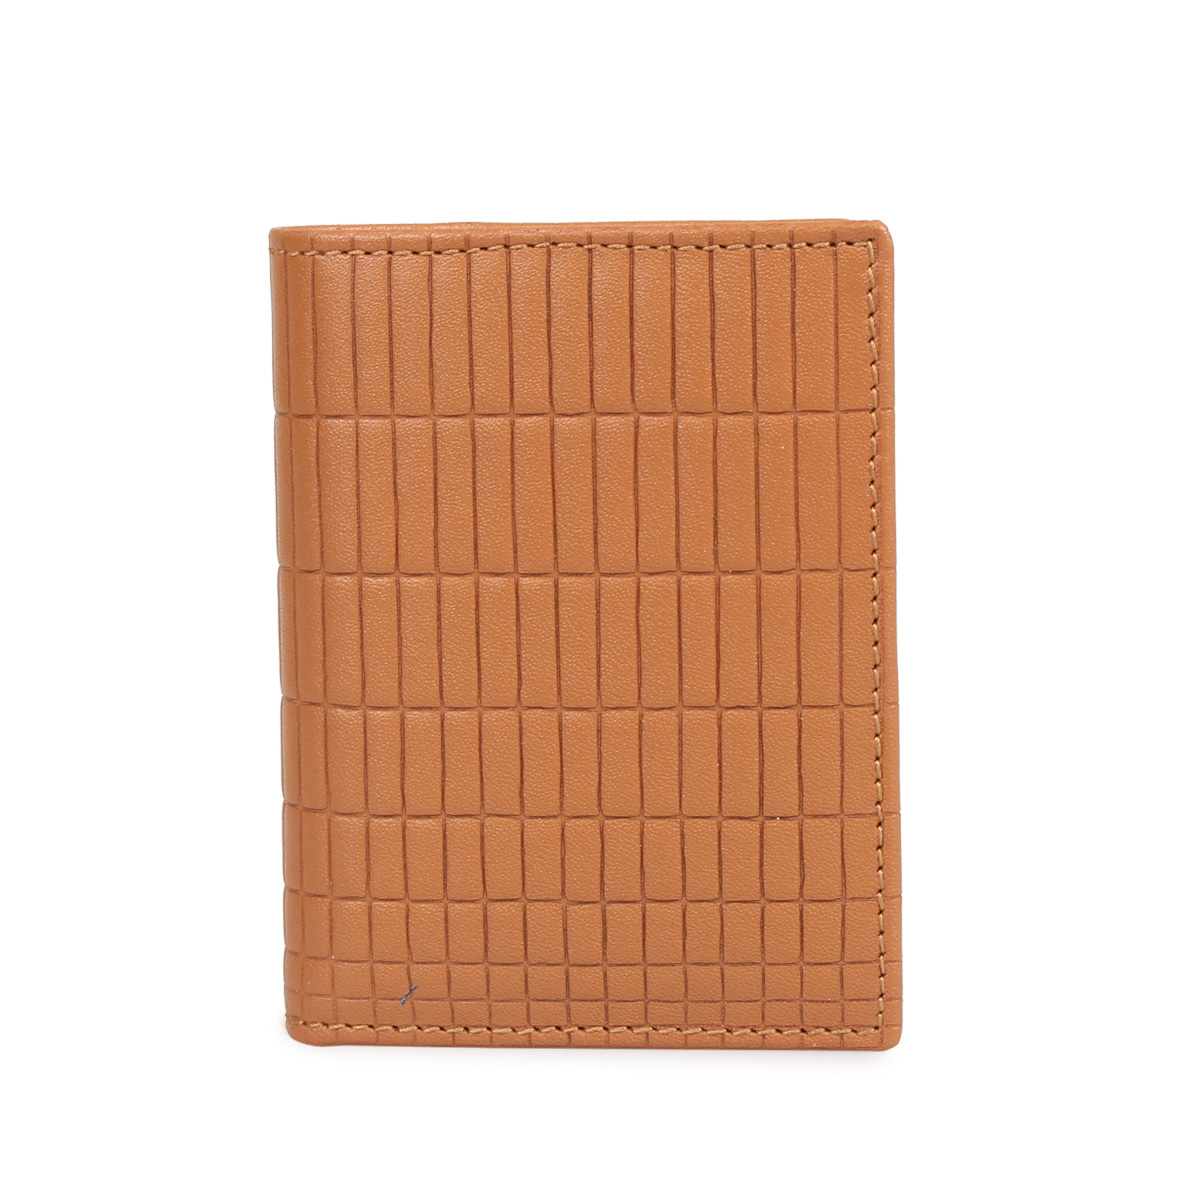 COMME des GARCONS BRICK LINE WALLET コムデギャルソン 財布 二つ折り メンズ レディース ベージュ SA0641BK